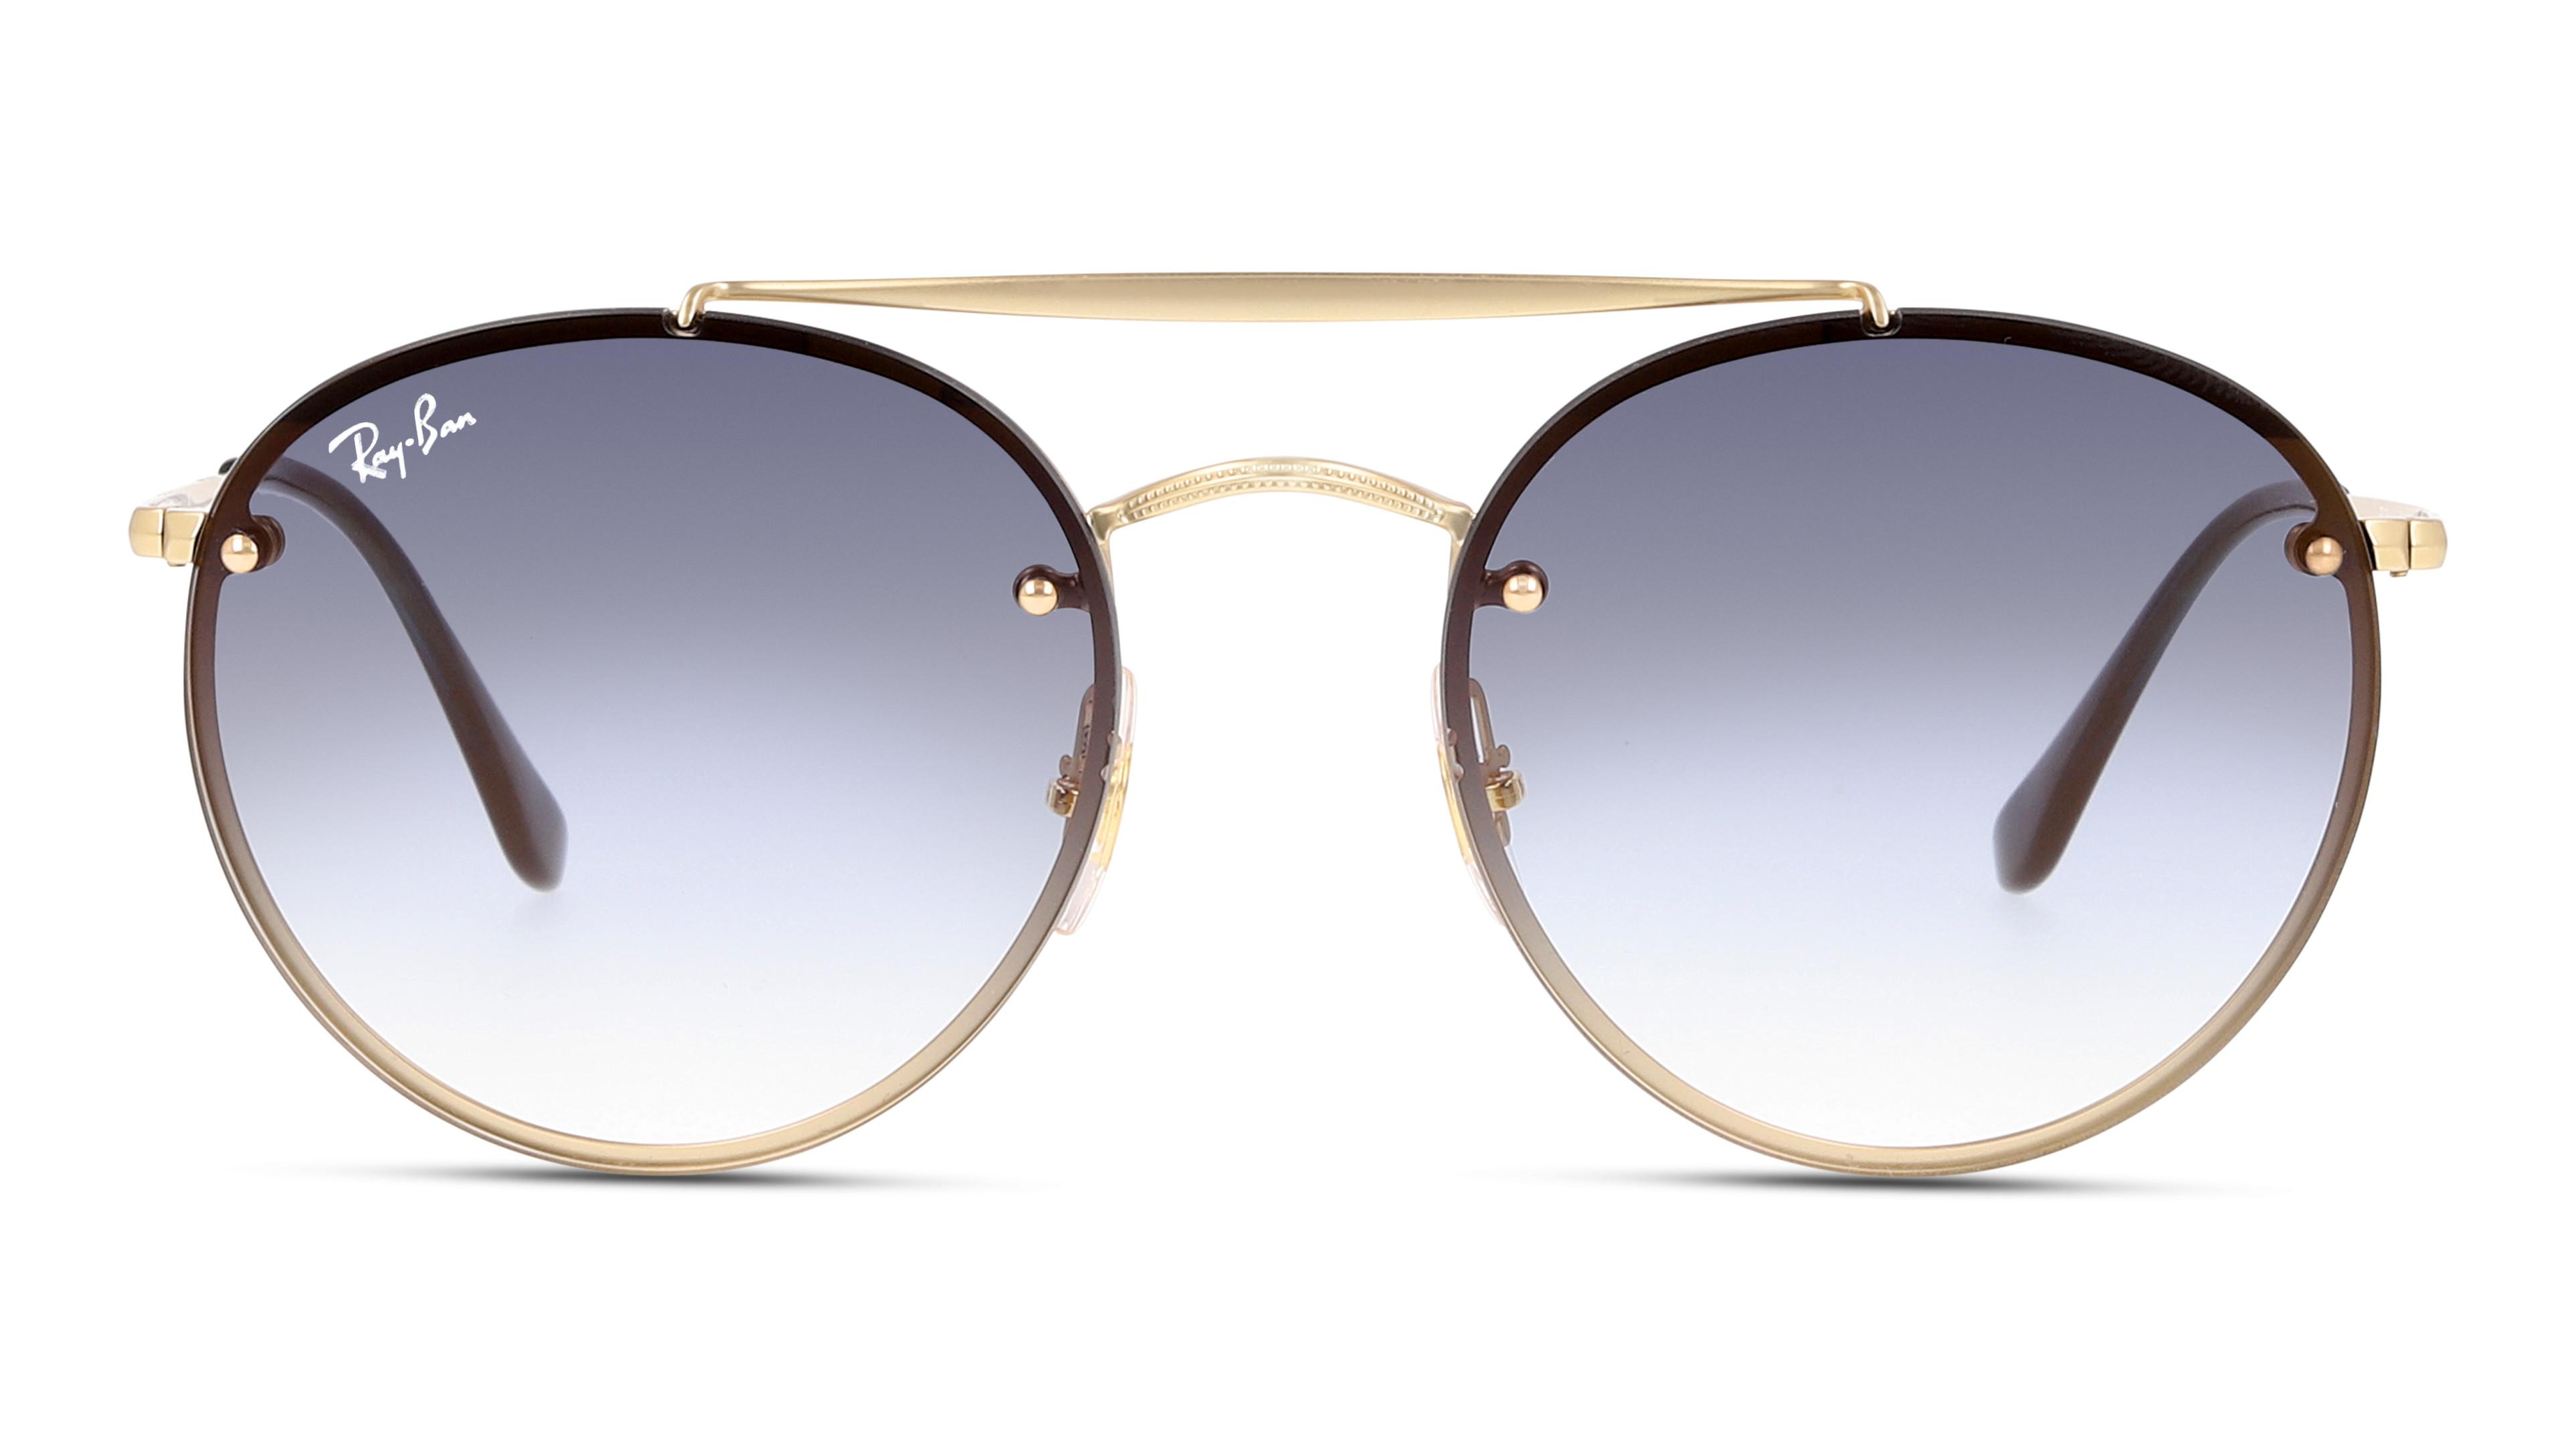 8056597017886-front-01-ray-ban-0rb3614n-eyewear-demi-gloss-gold